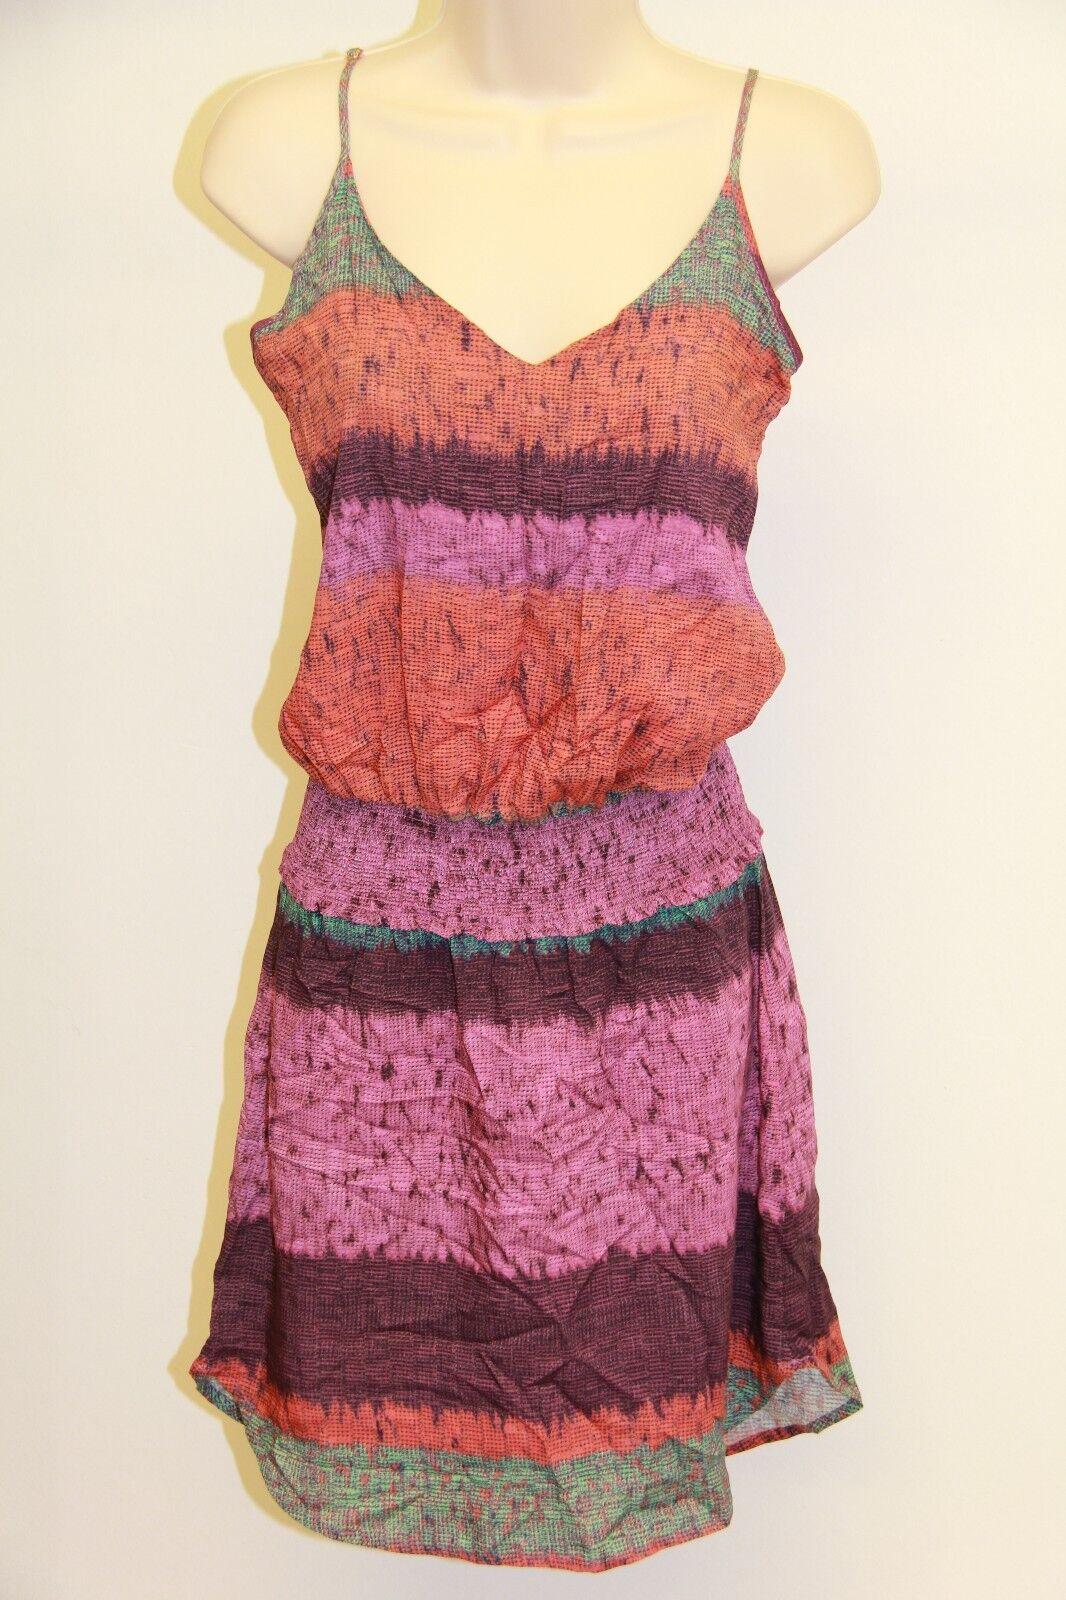 NWT ViX by Paula Hermanny Swimsuit Cover up Tunic Sz S Acai Zoe Short Dress  188